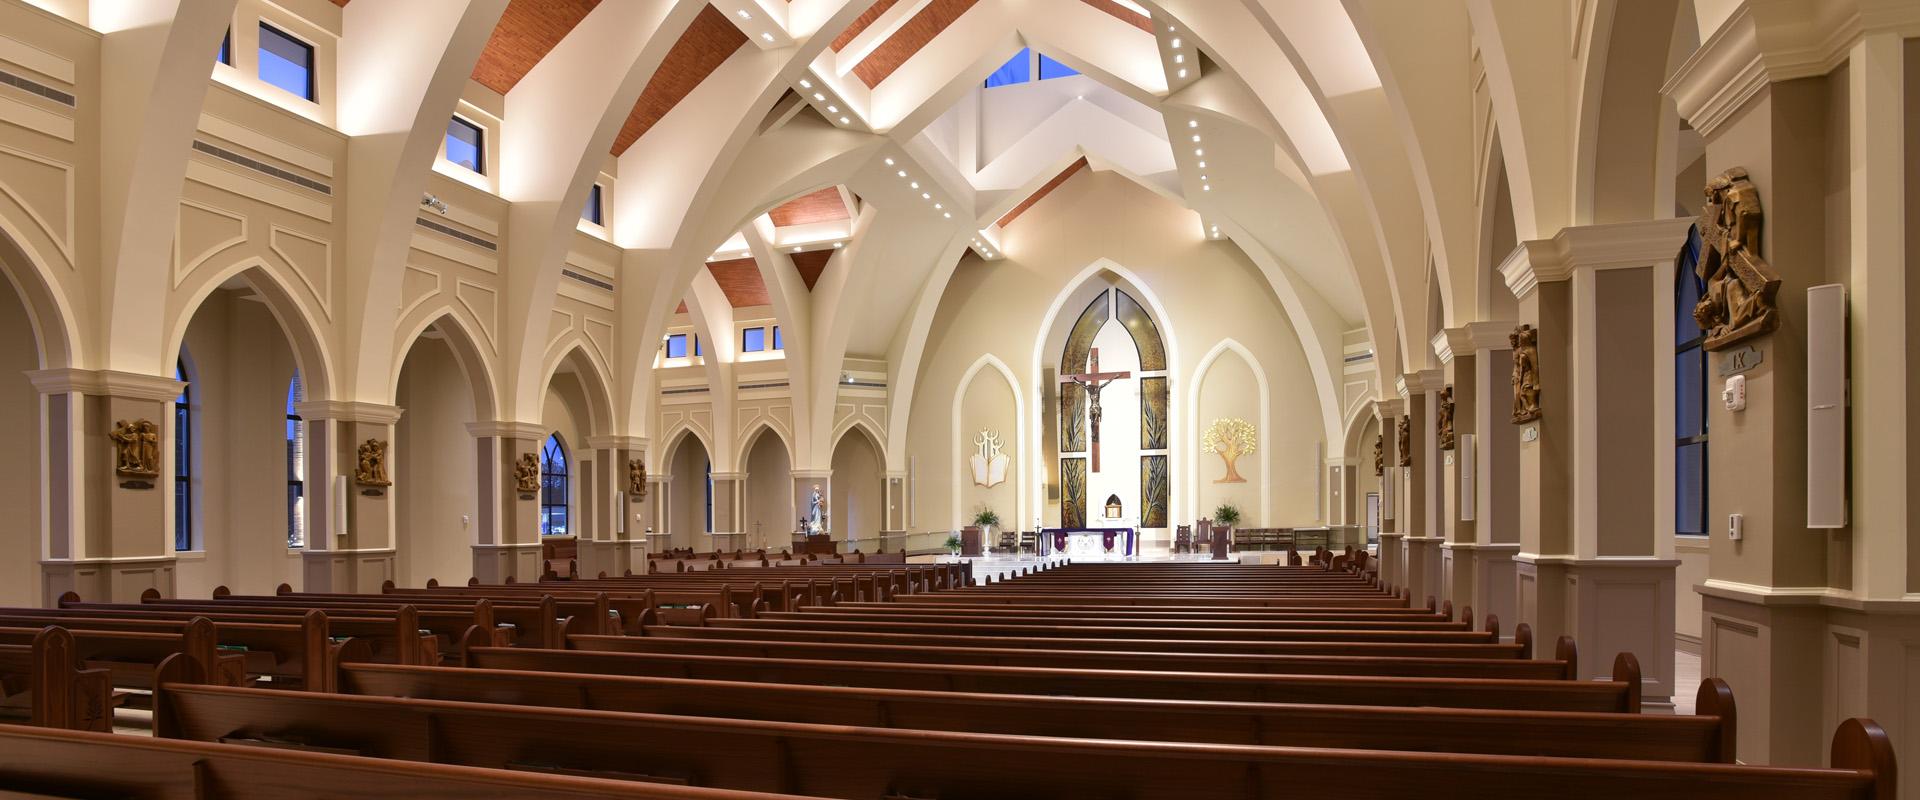 Holy Vietnamese Martyrs Catholic Church - Sanctuary